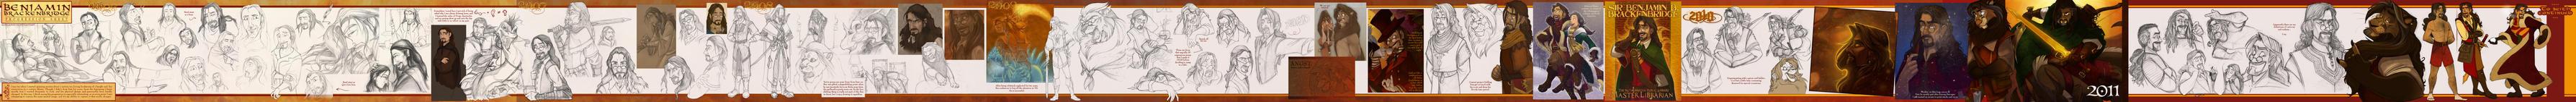 Ben Progression Sheet 06-11 by Altalamatox